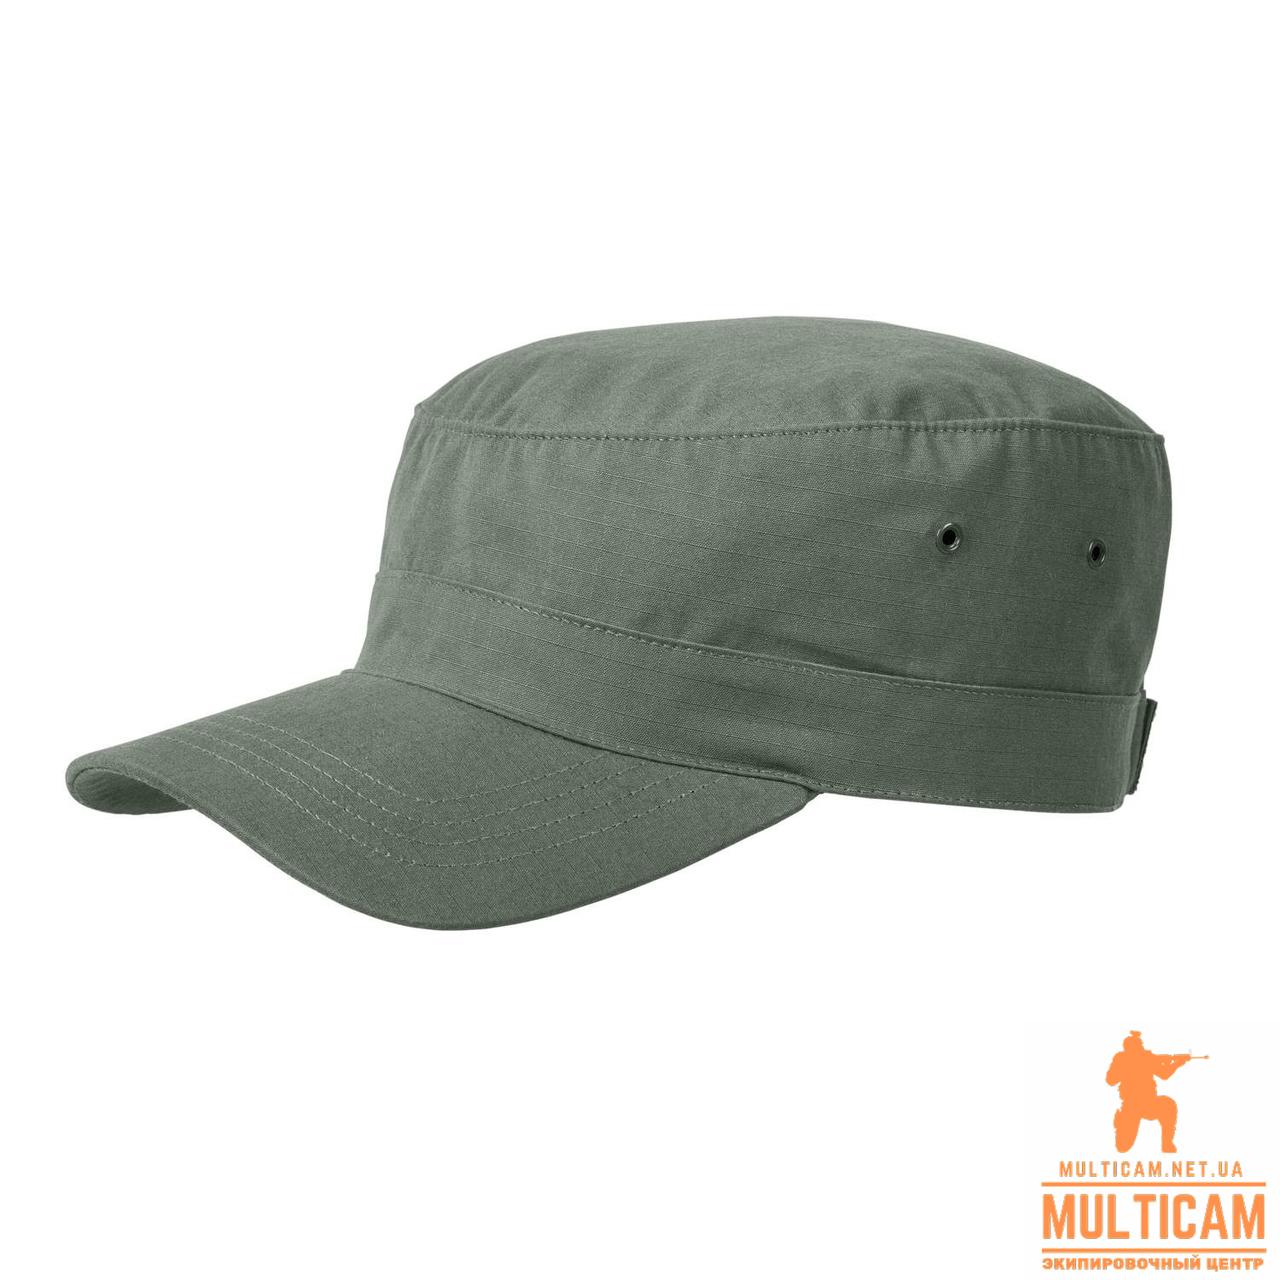 Кепка военная Helikon-Tex® COMBAT Cap - PolyCotton Ripstop - Olive Drab